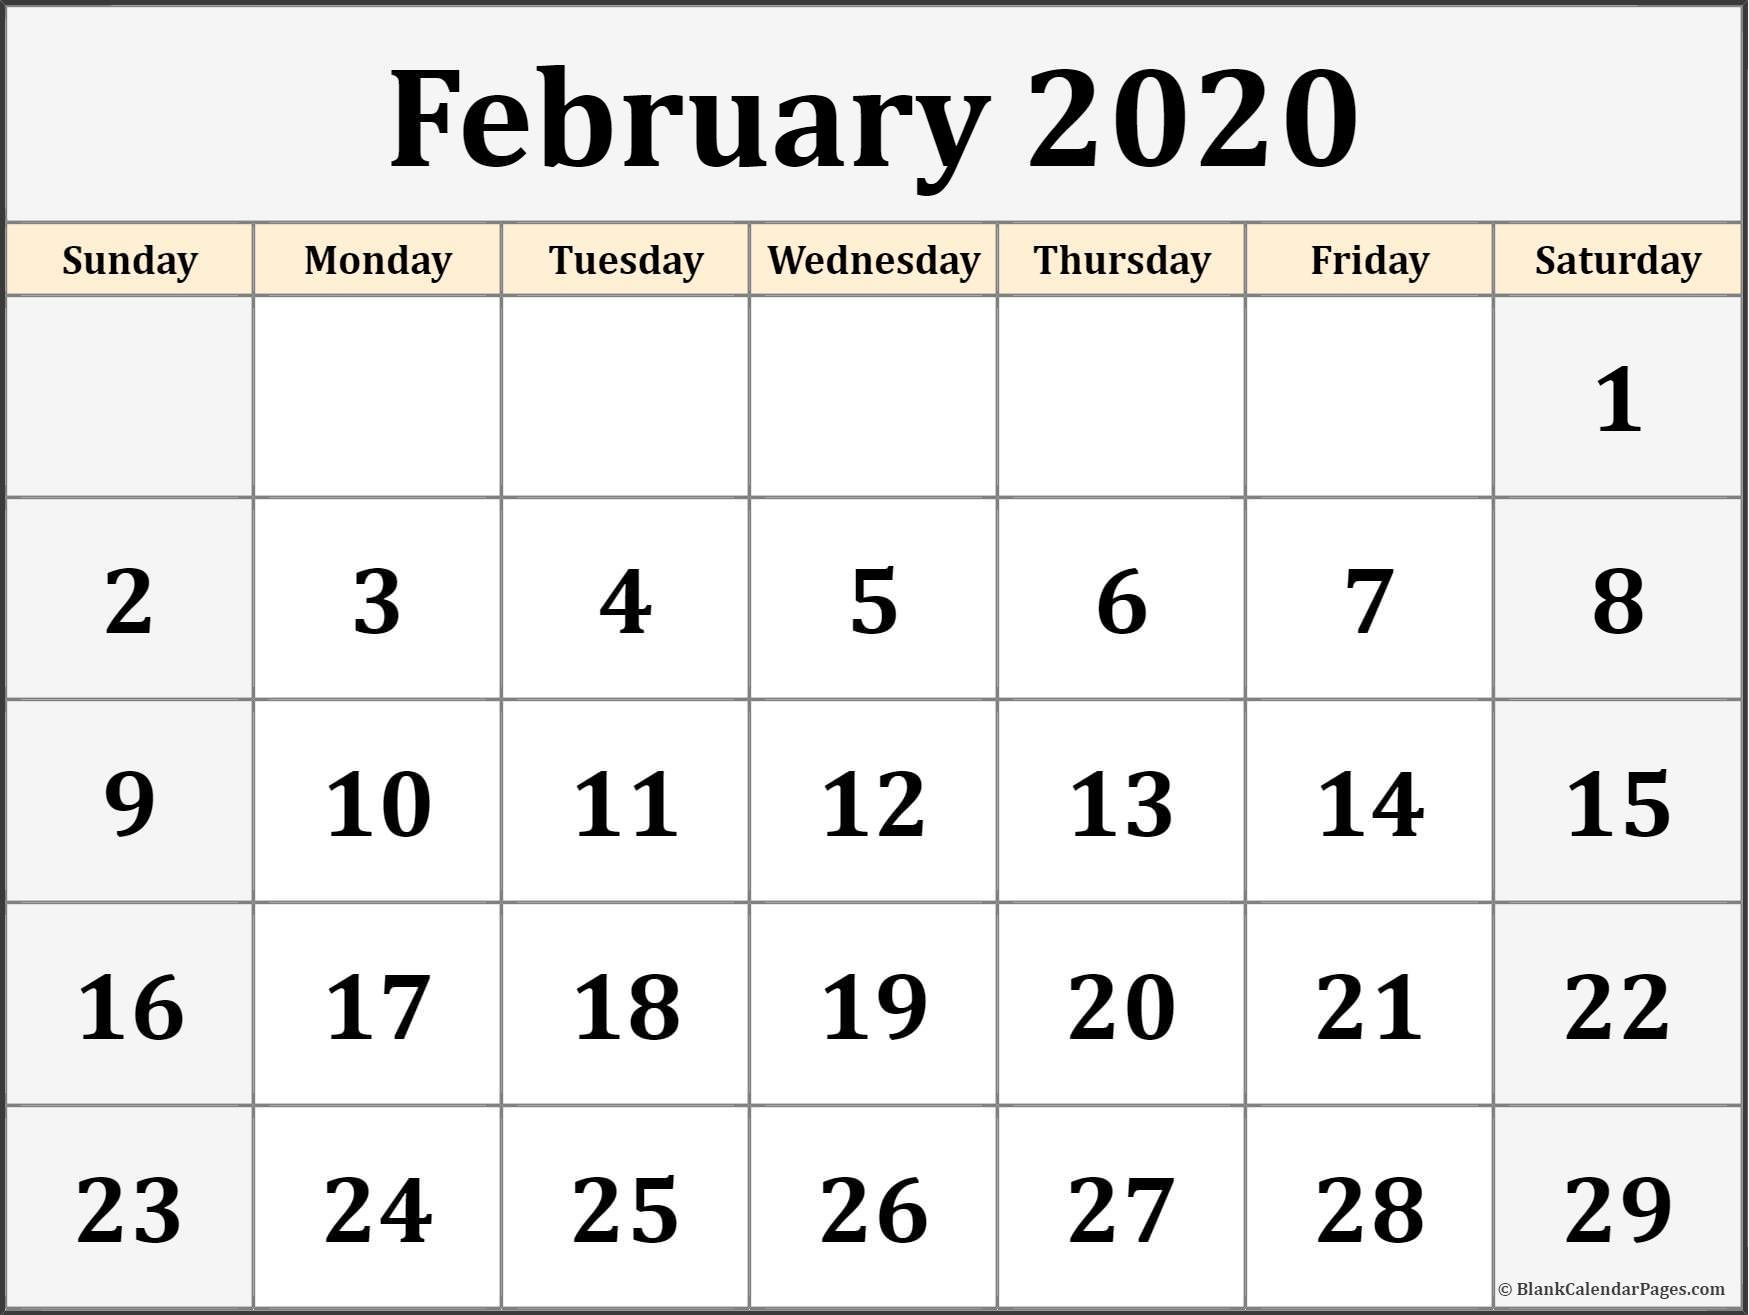 2019 February Calendar with Holidays